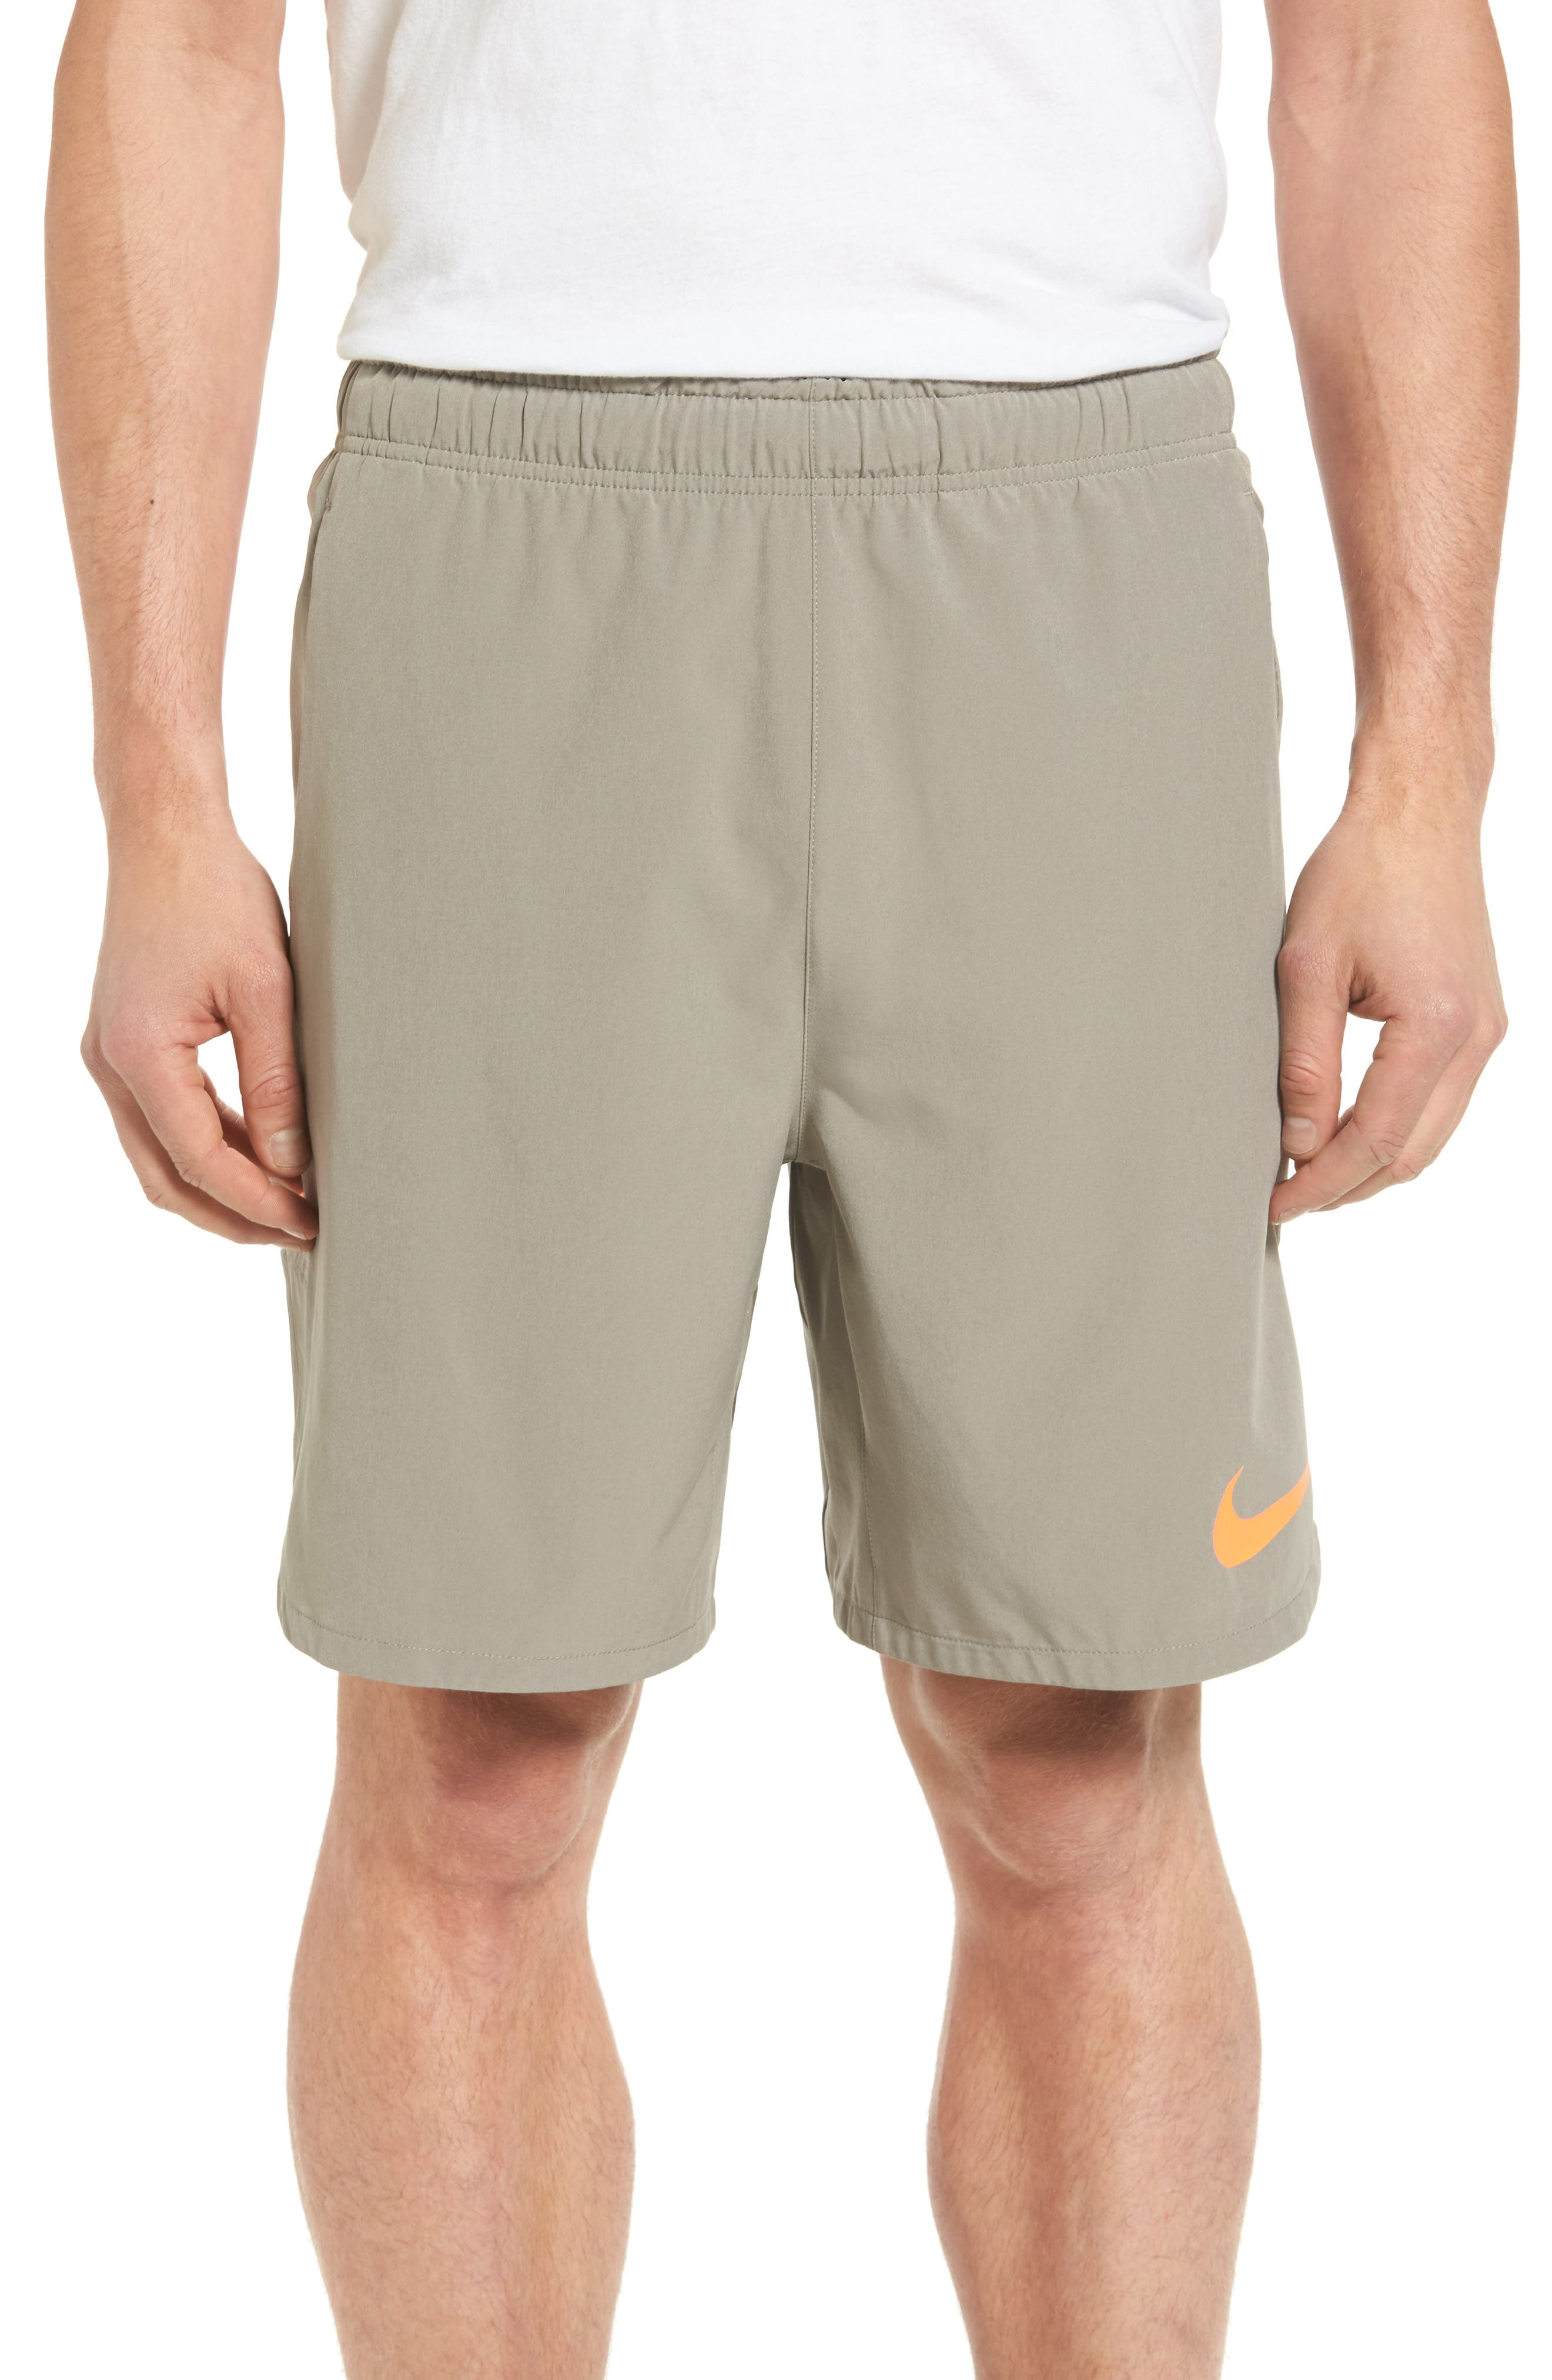 Flex Training Shorts,                         Main,                         color,